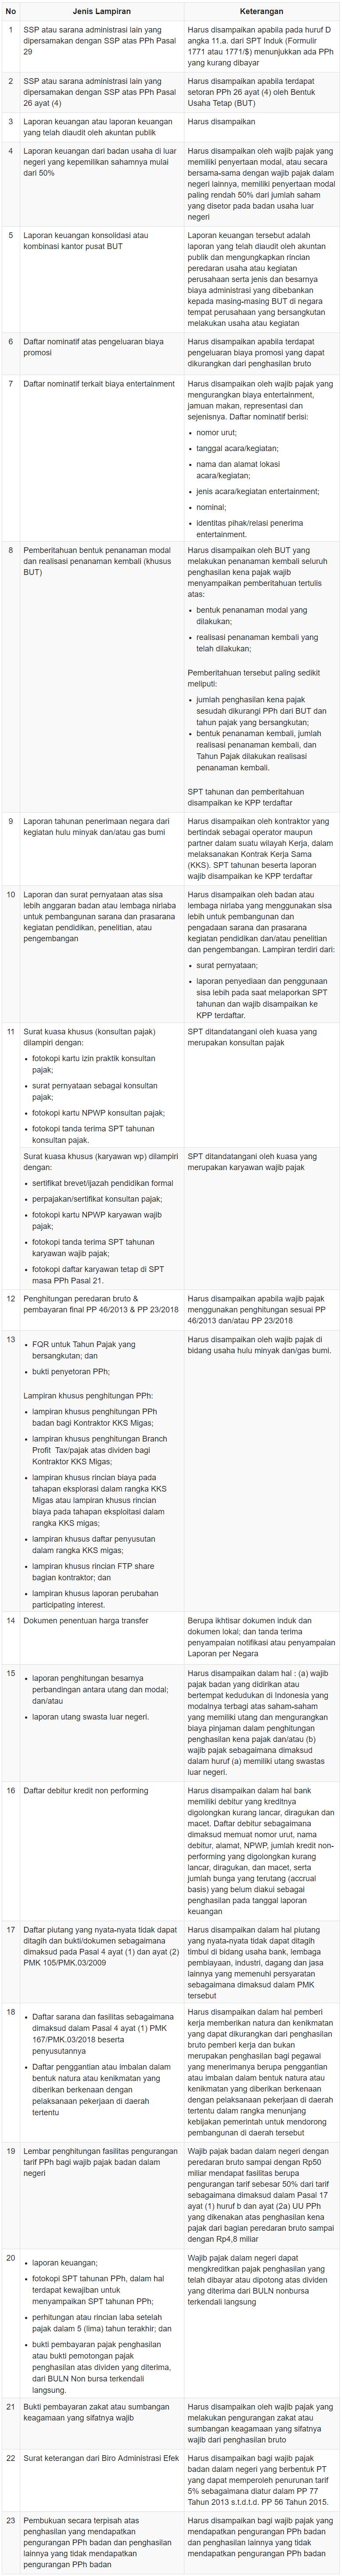 Daftar Dokumen Lampiran Spt Tahunan Pph Op Badan